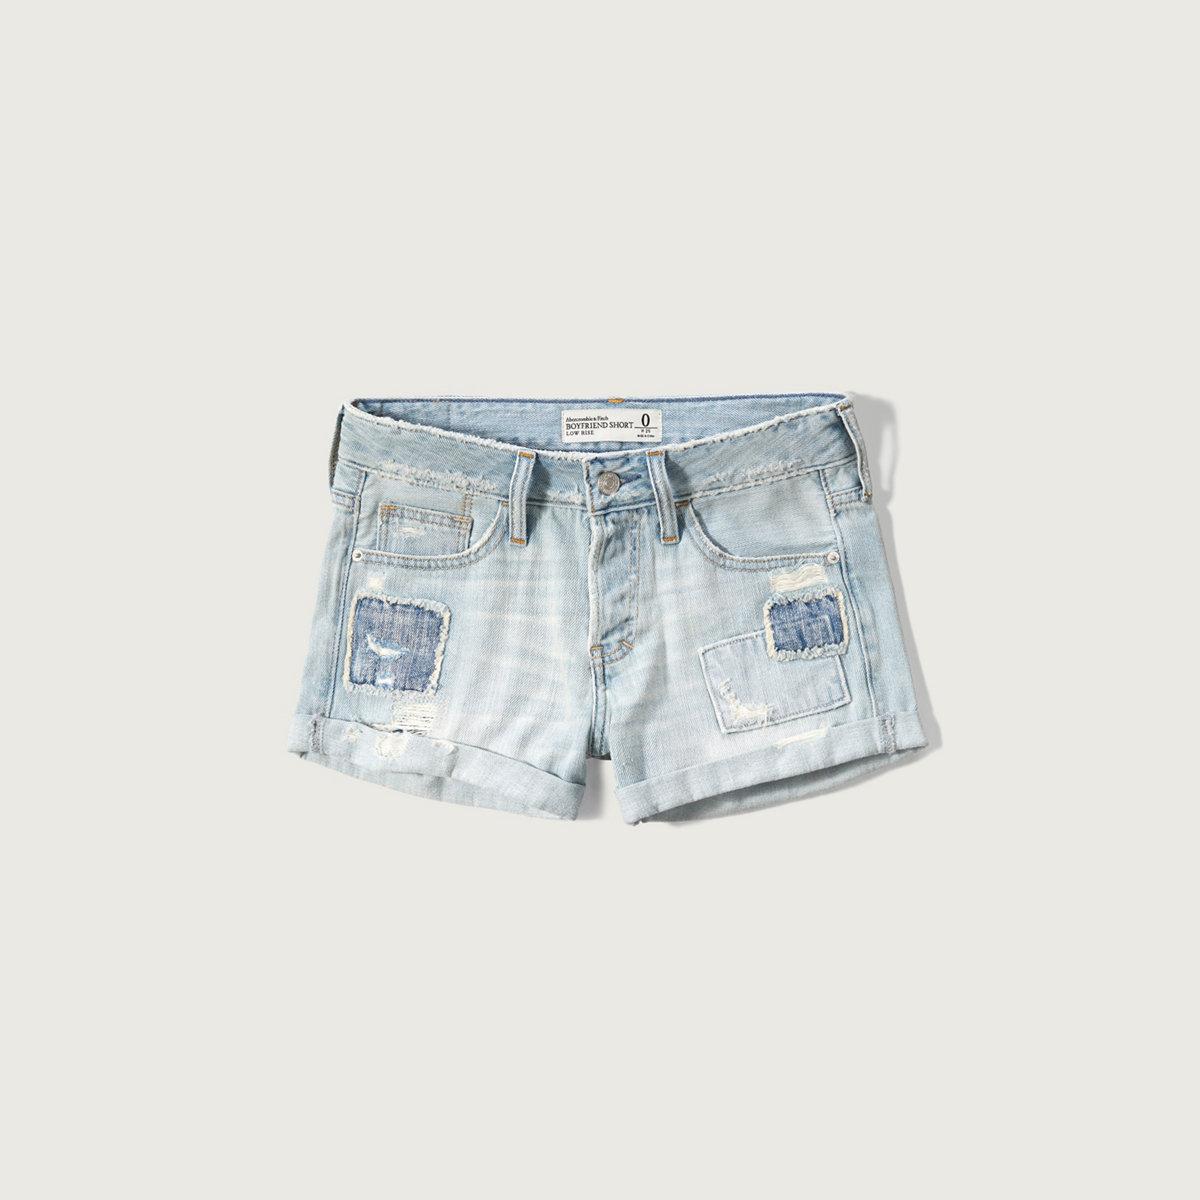 Patched Boyfriend Shorts